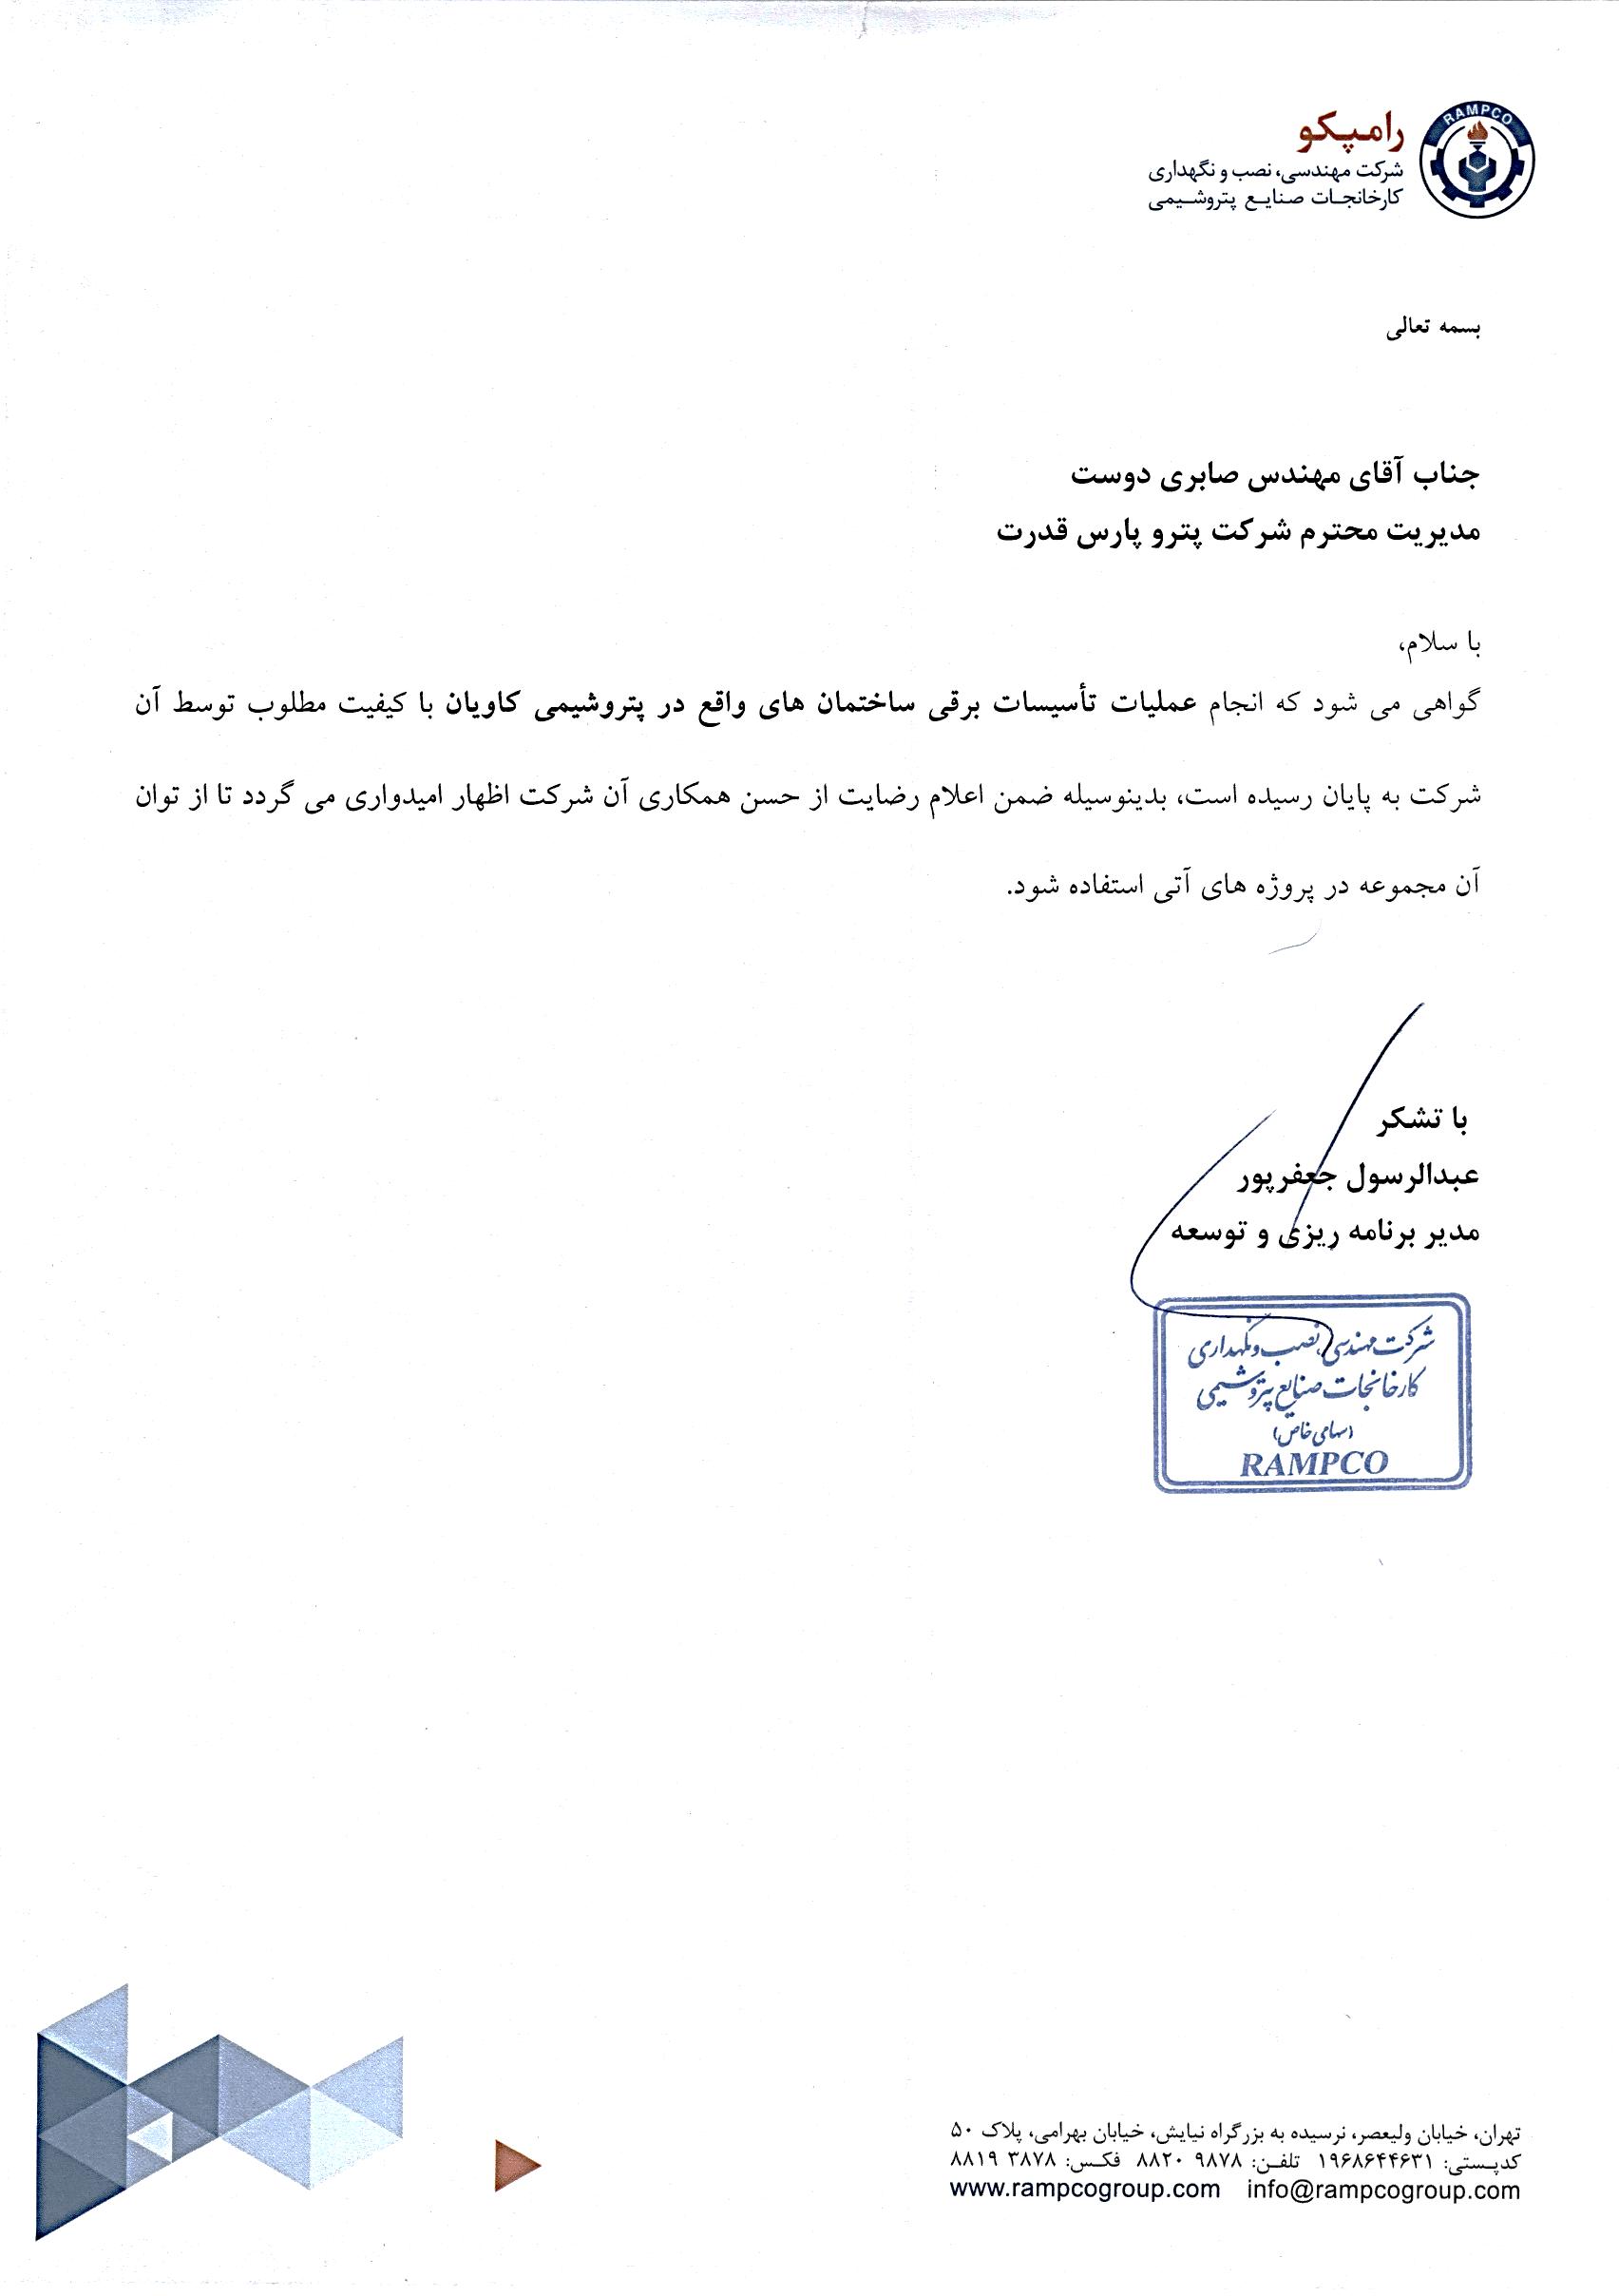 Petro pars ghodrat certificates گواهینامه های شرکت پترو پارس قدرت